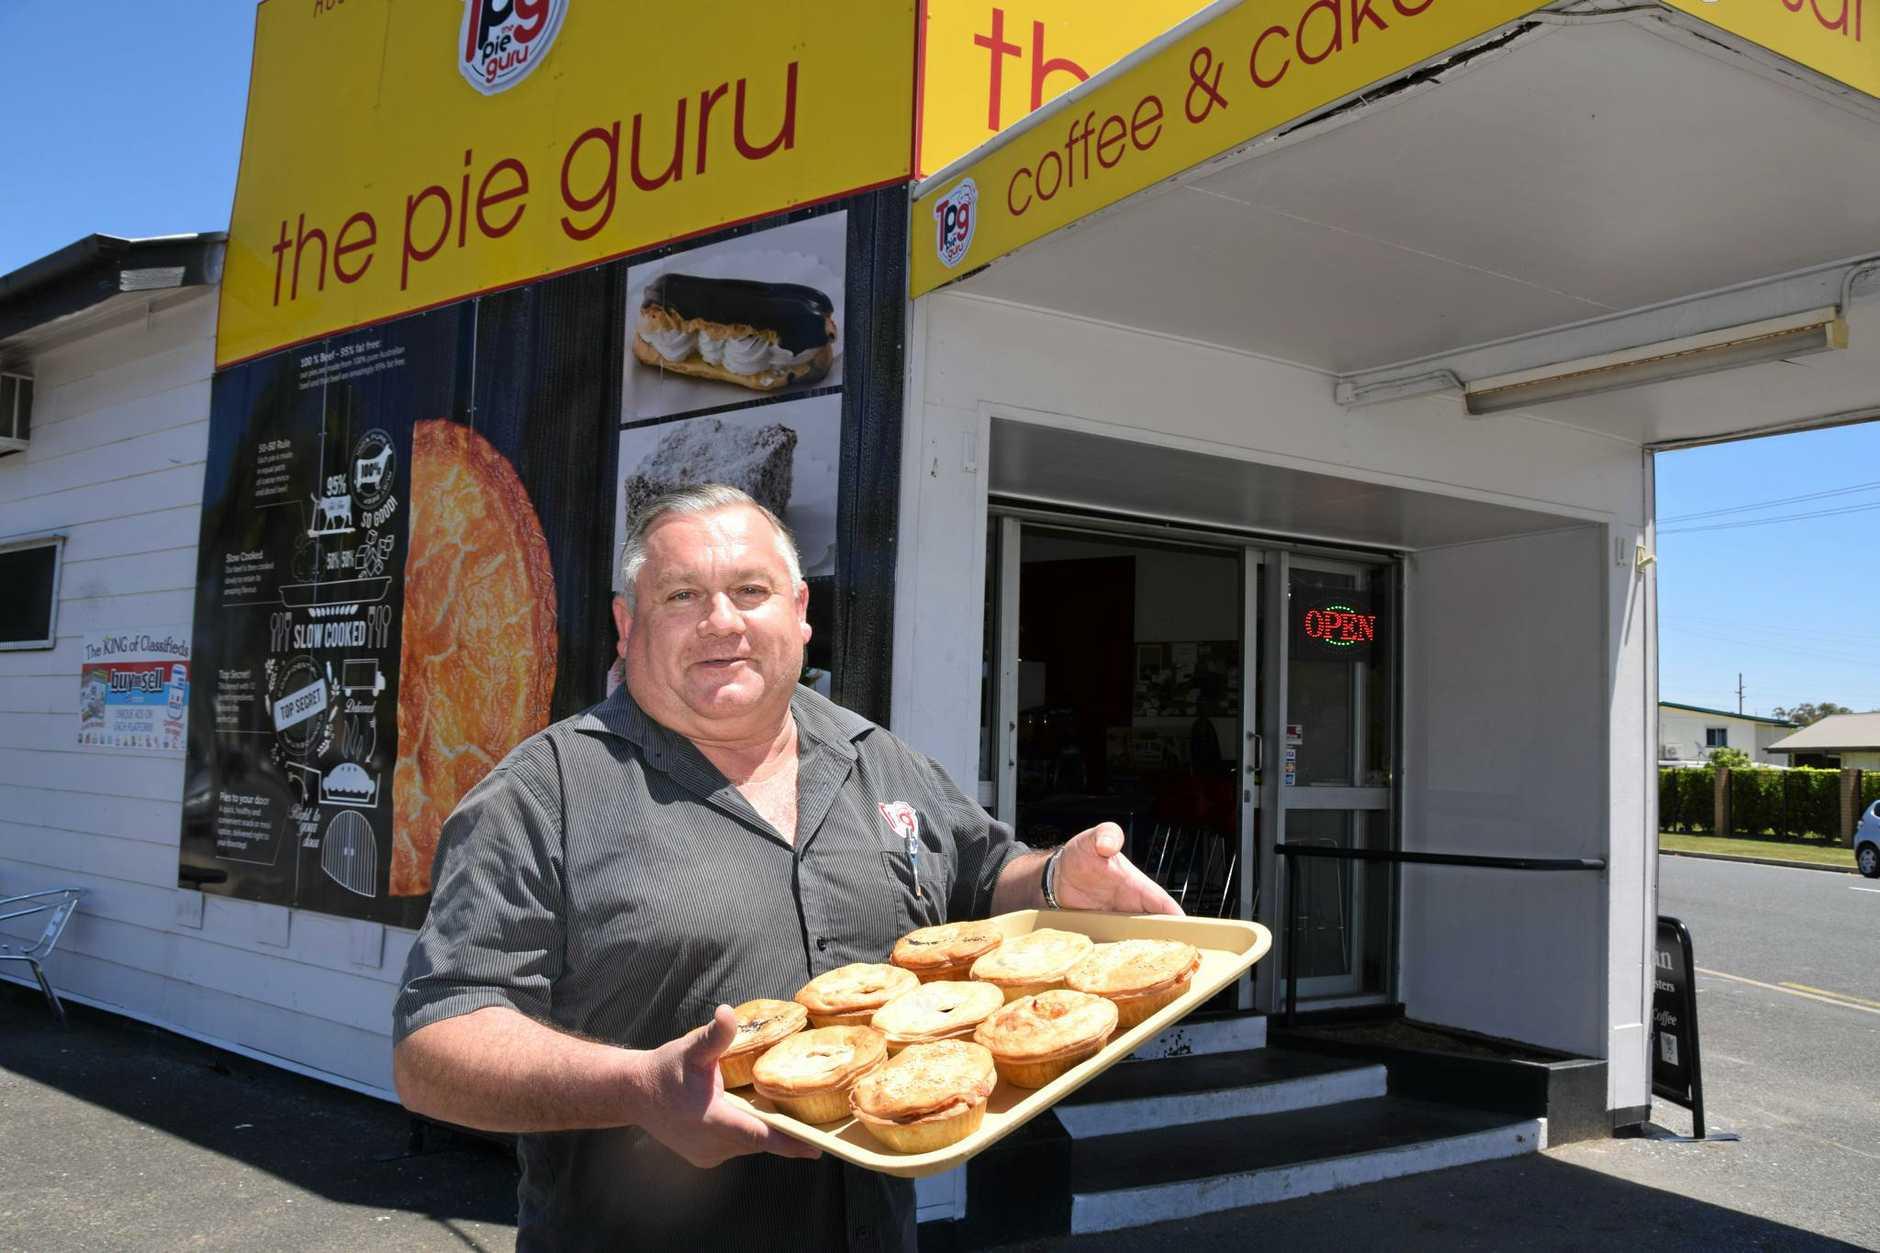 The Pie Guru owner Stevan Davies and his puff pastry goods.